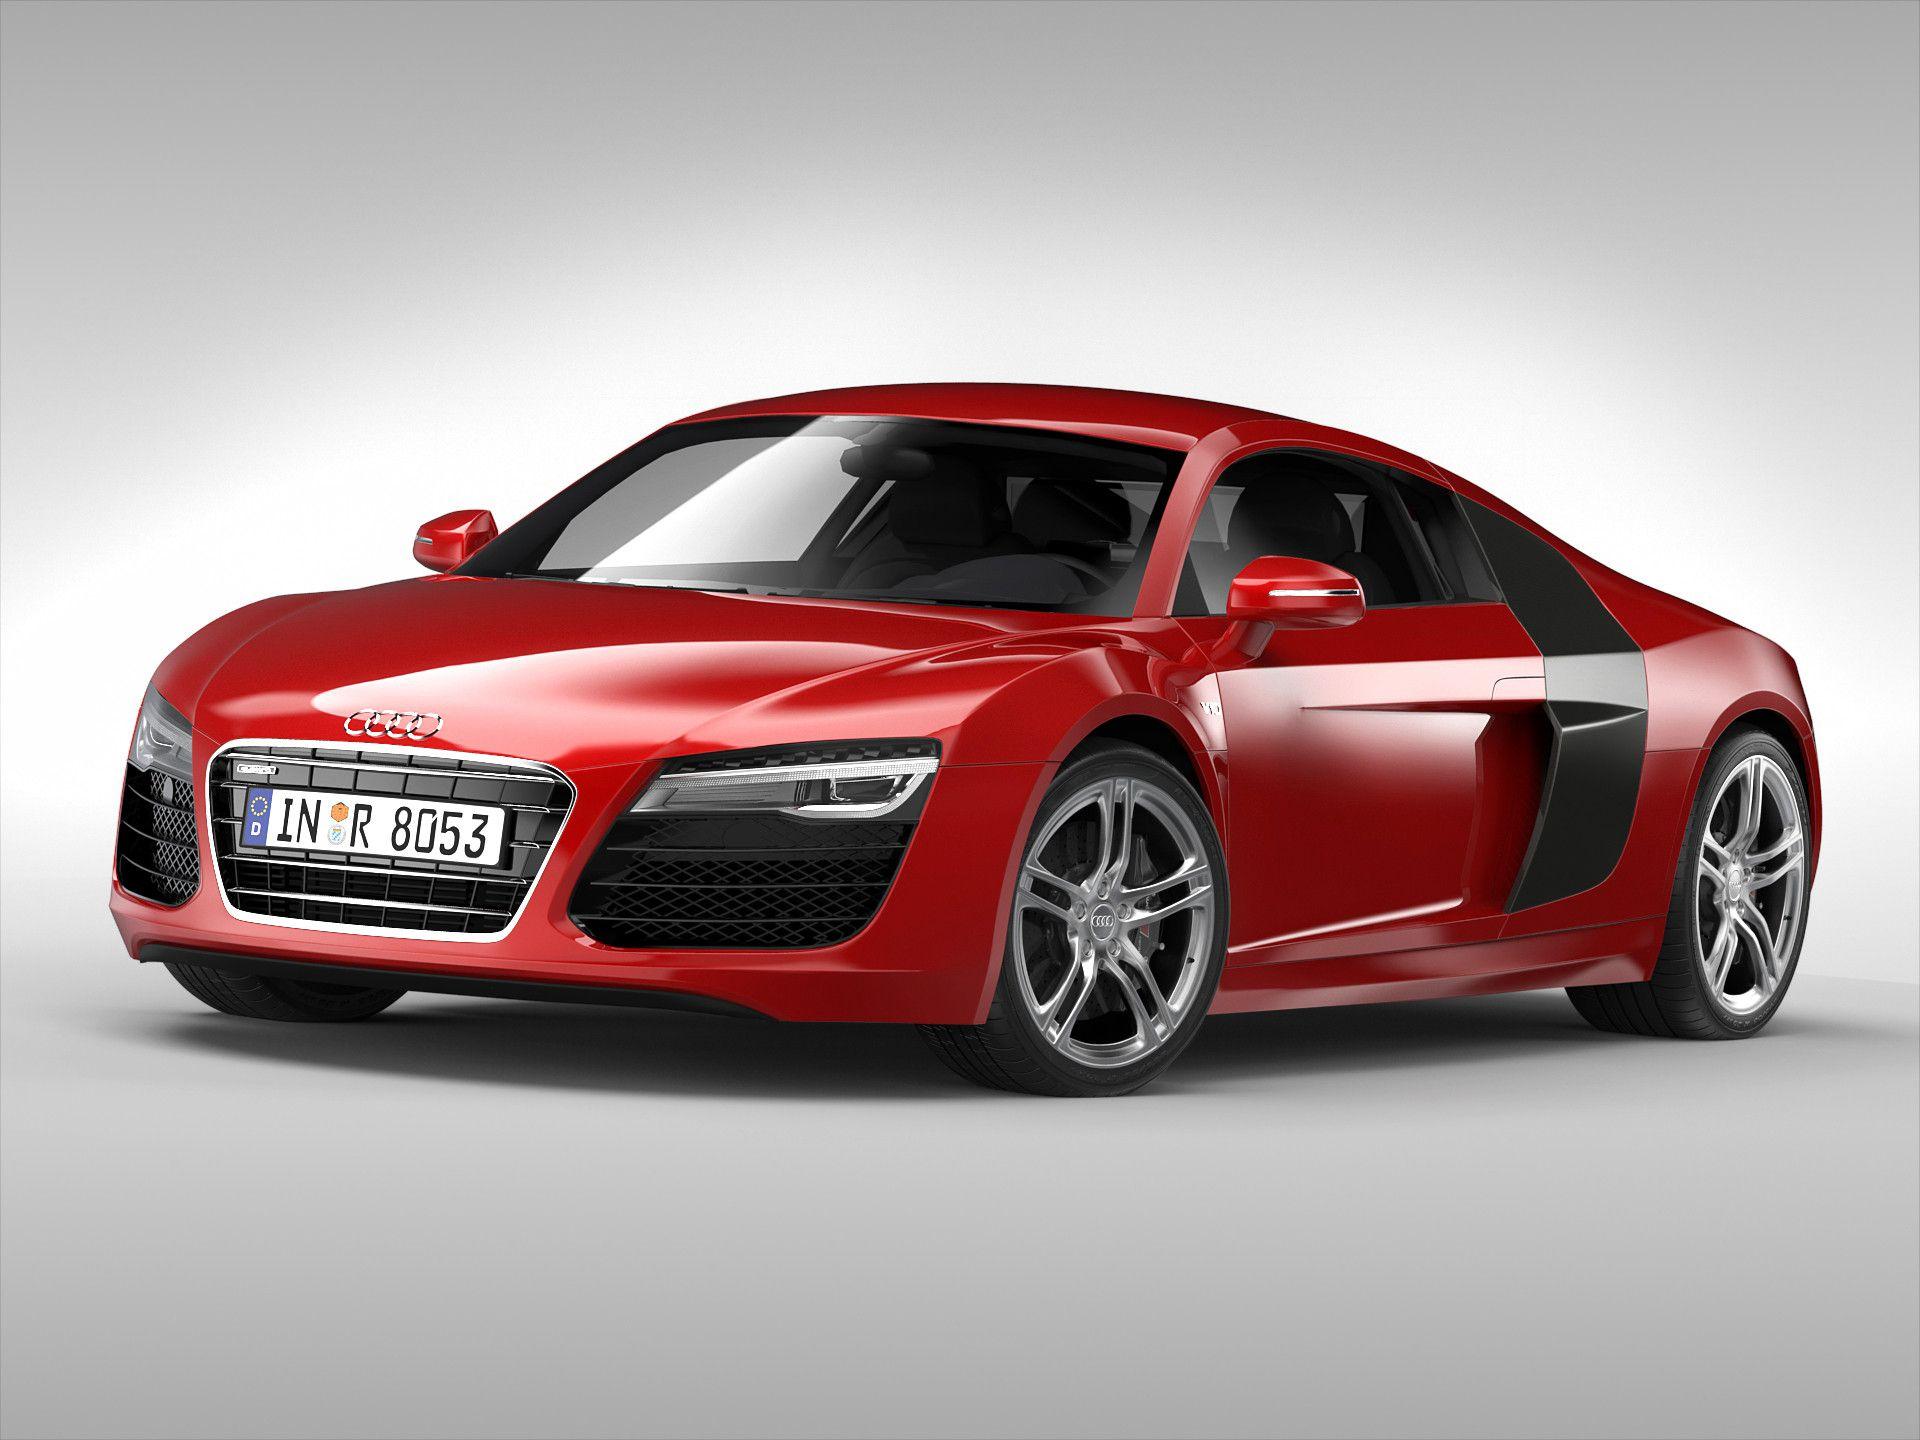 Max Audi Car D Model DModeling Pinterest Audi Cars And D - Audi car 3d games